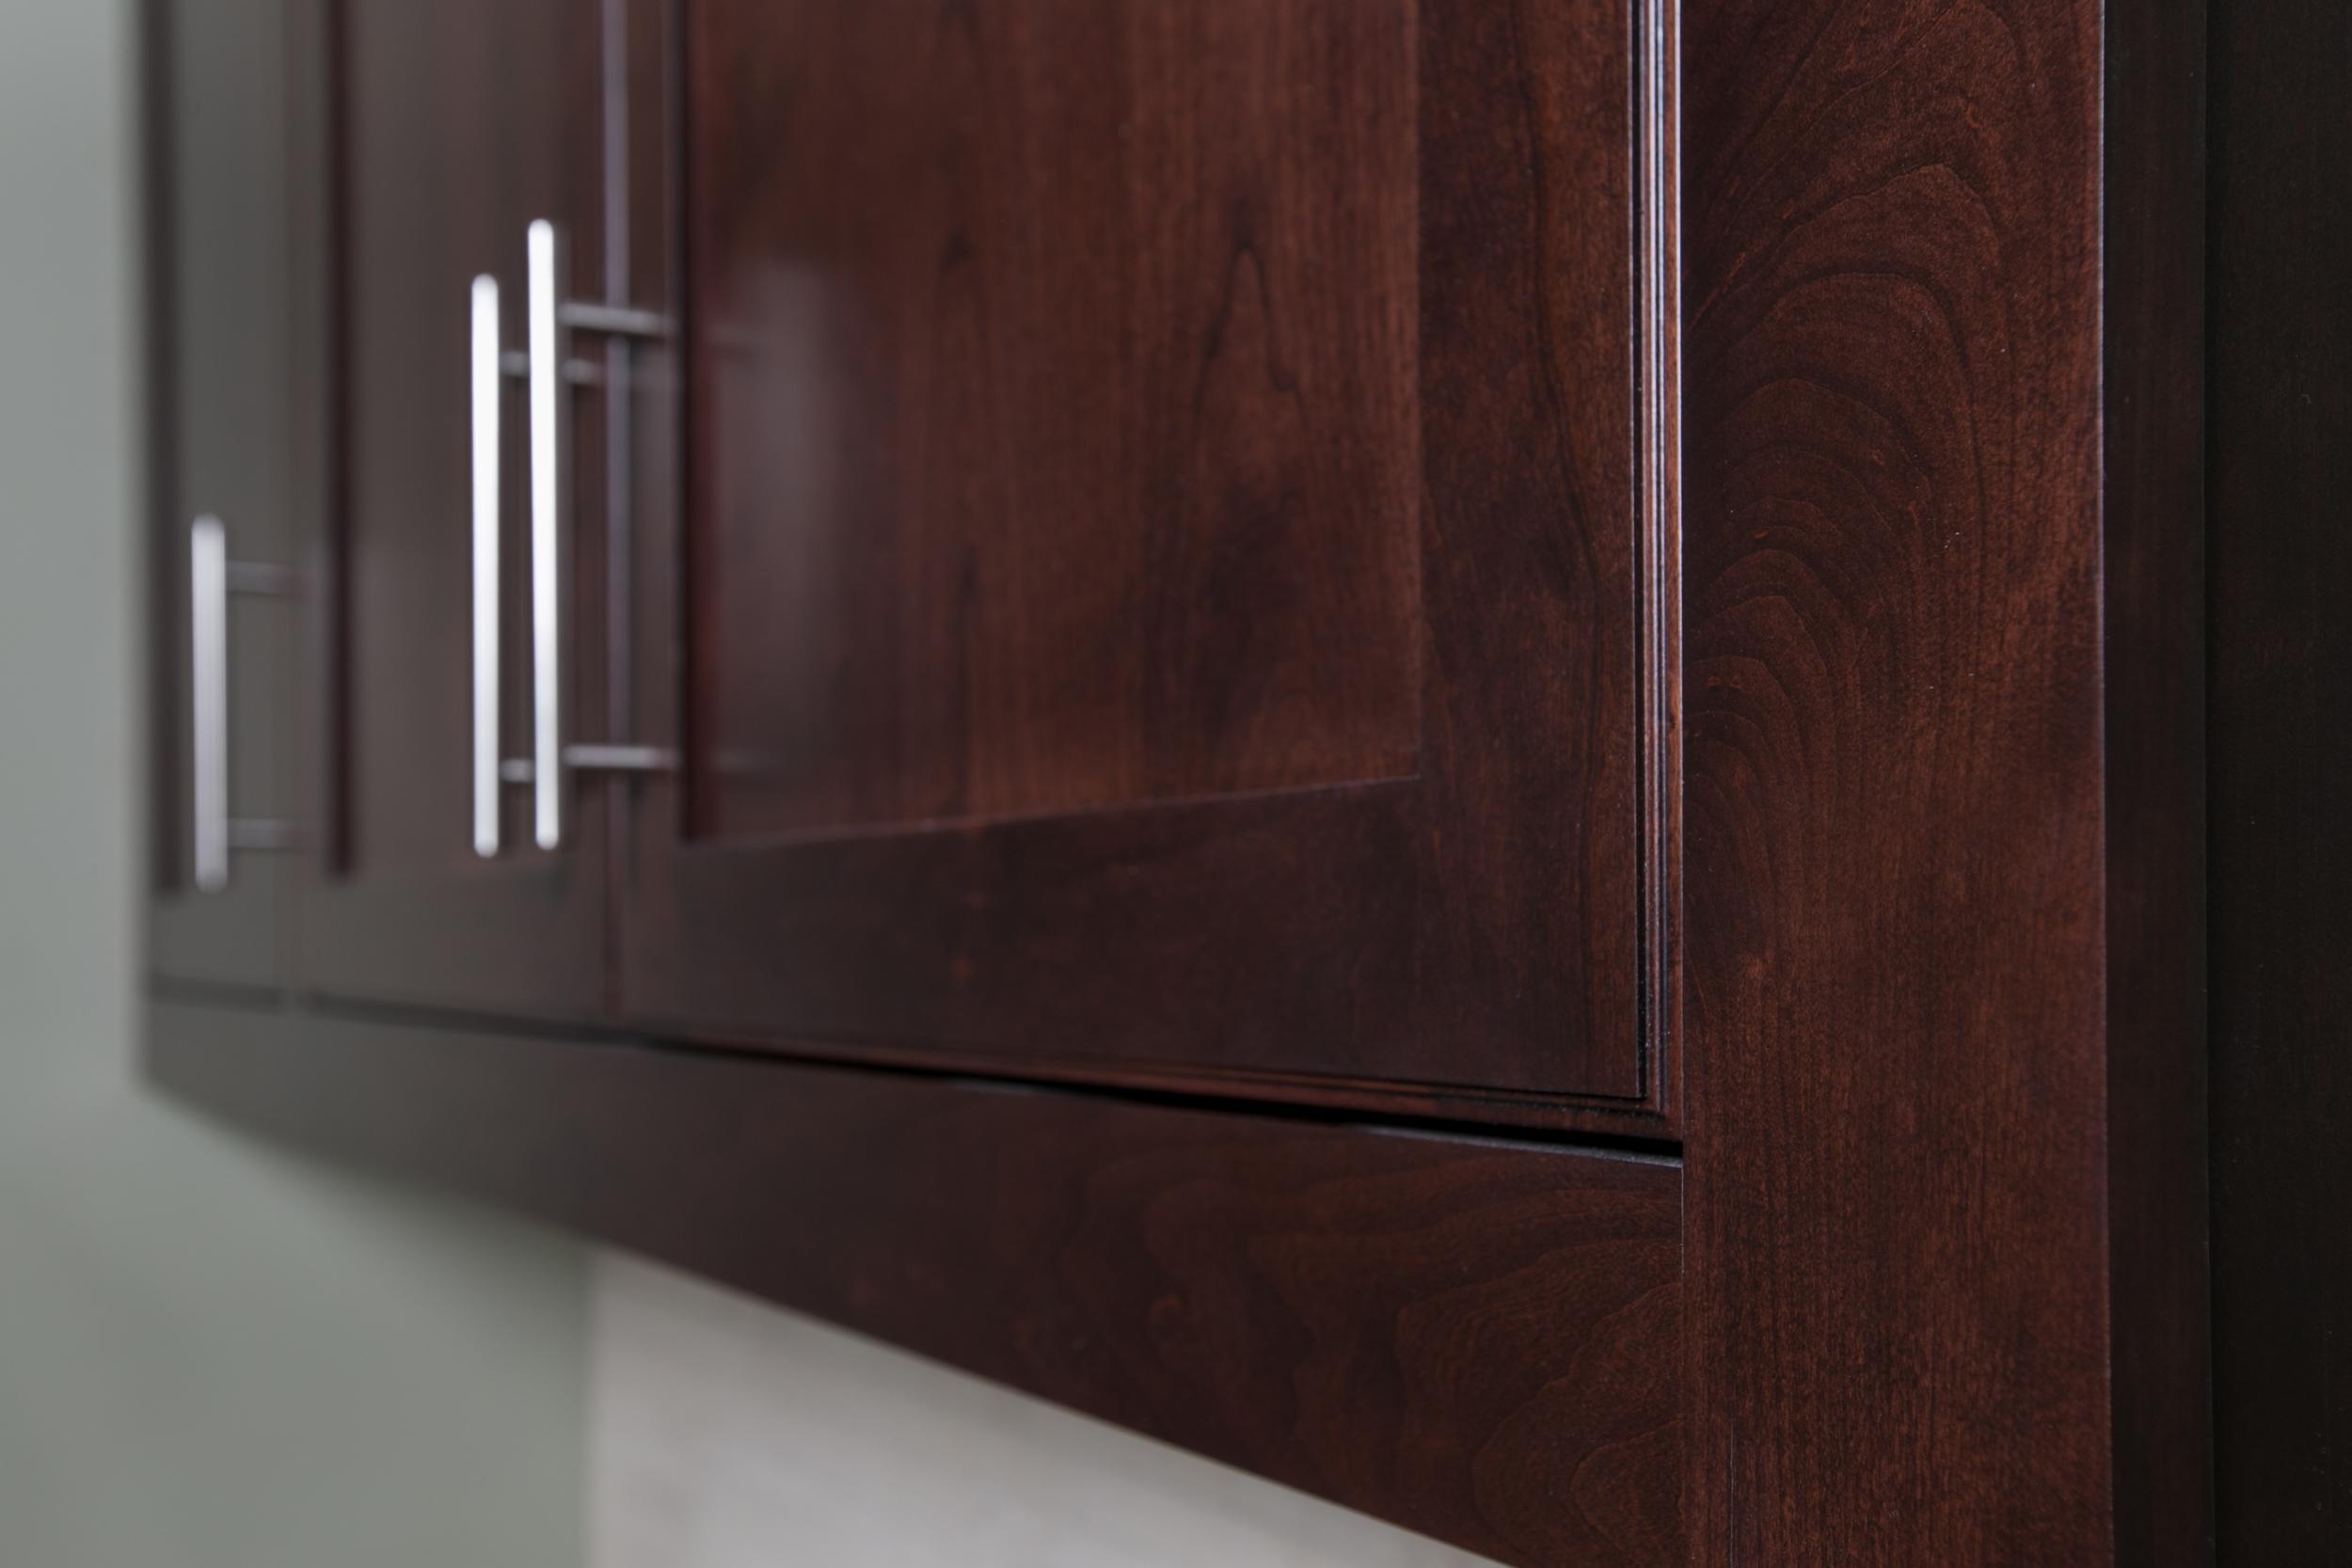 Inset Contemporary Cherry Cabinet Doors